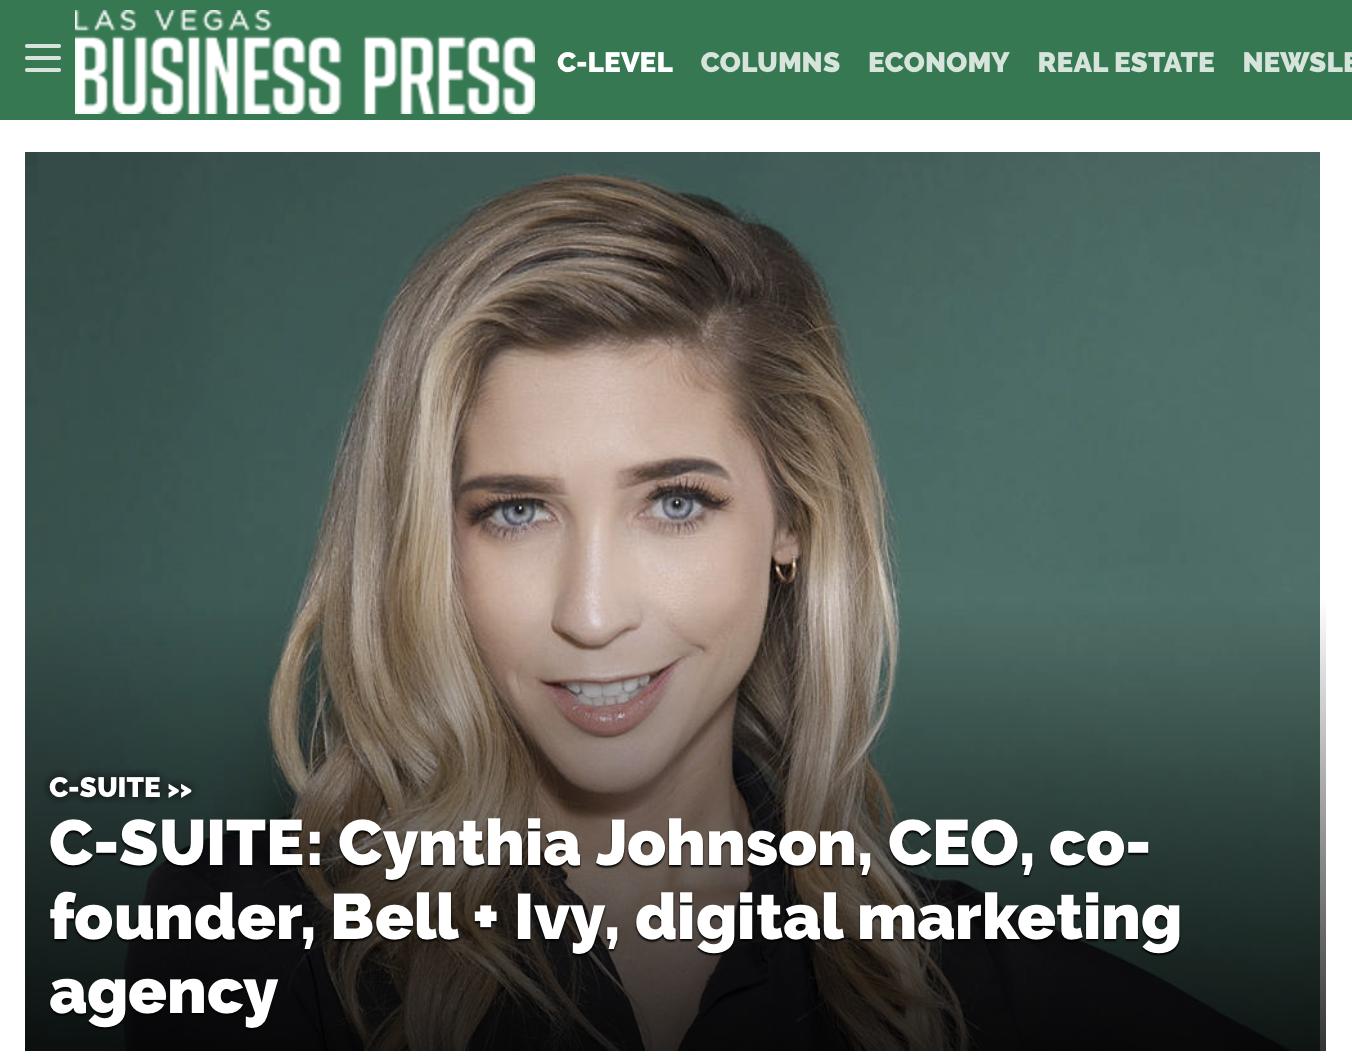 C-SUITE: Cynthia Johnson, CEO, co-founder, Bell + Ivy, digital marketing agency - LAS VEGAS BUSINESS PRESS